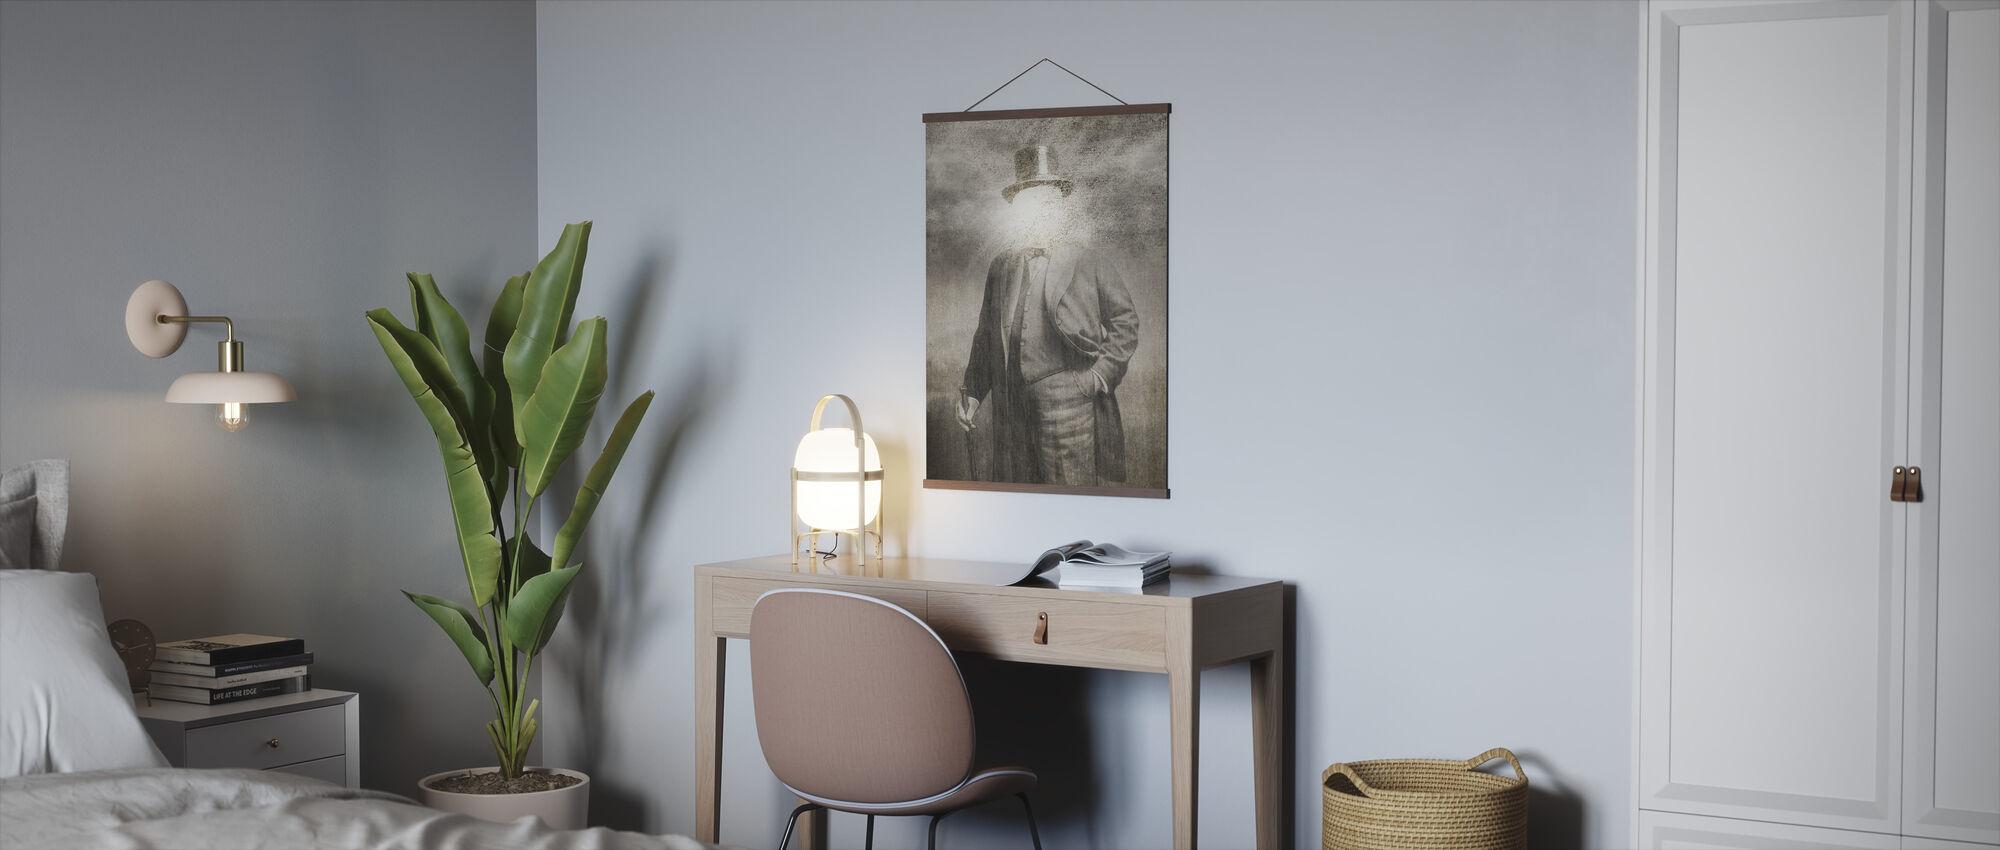 Mr. Sunshine - Poster - Office